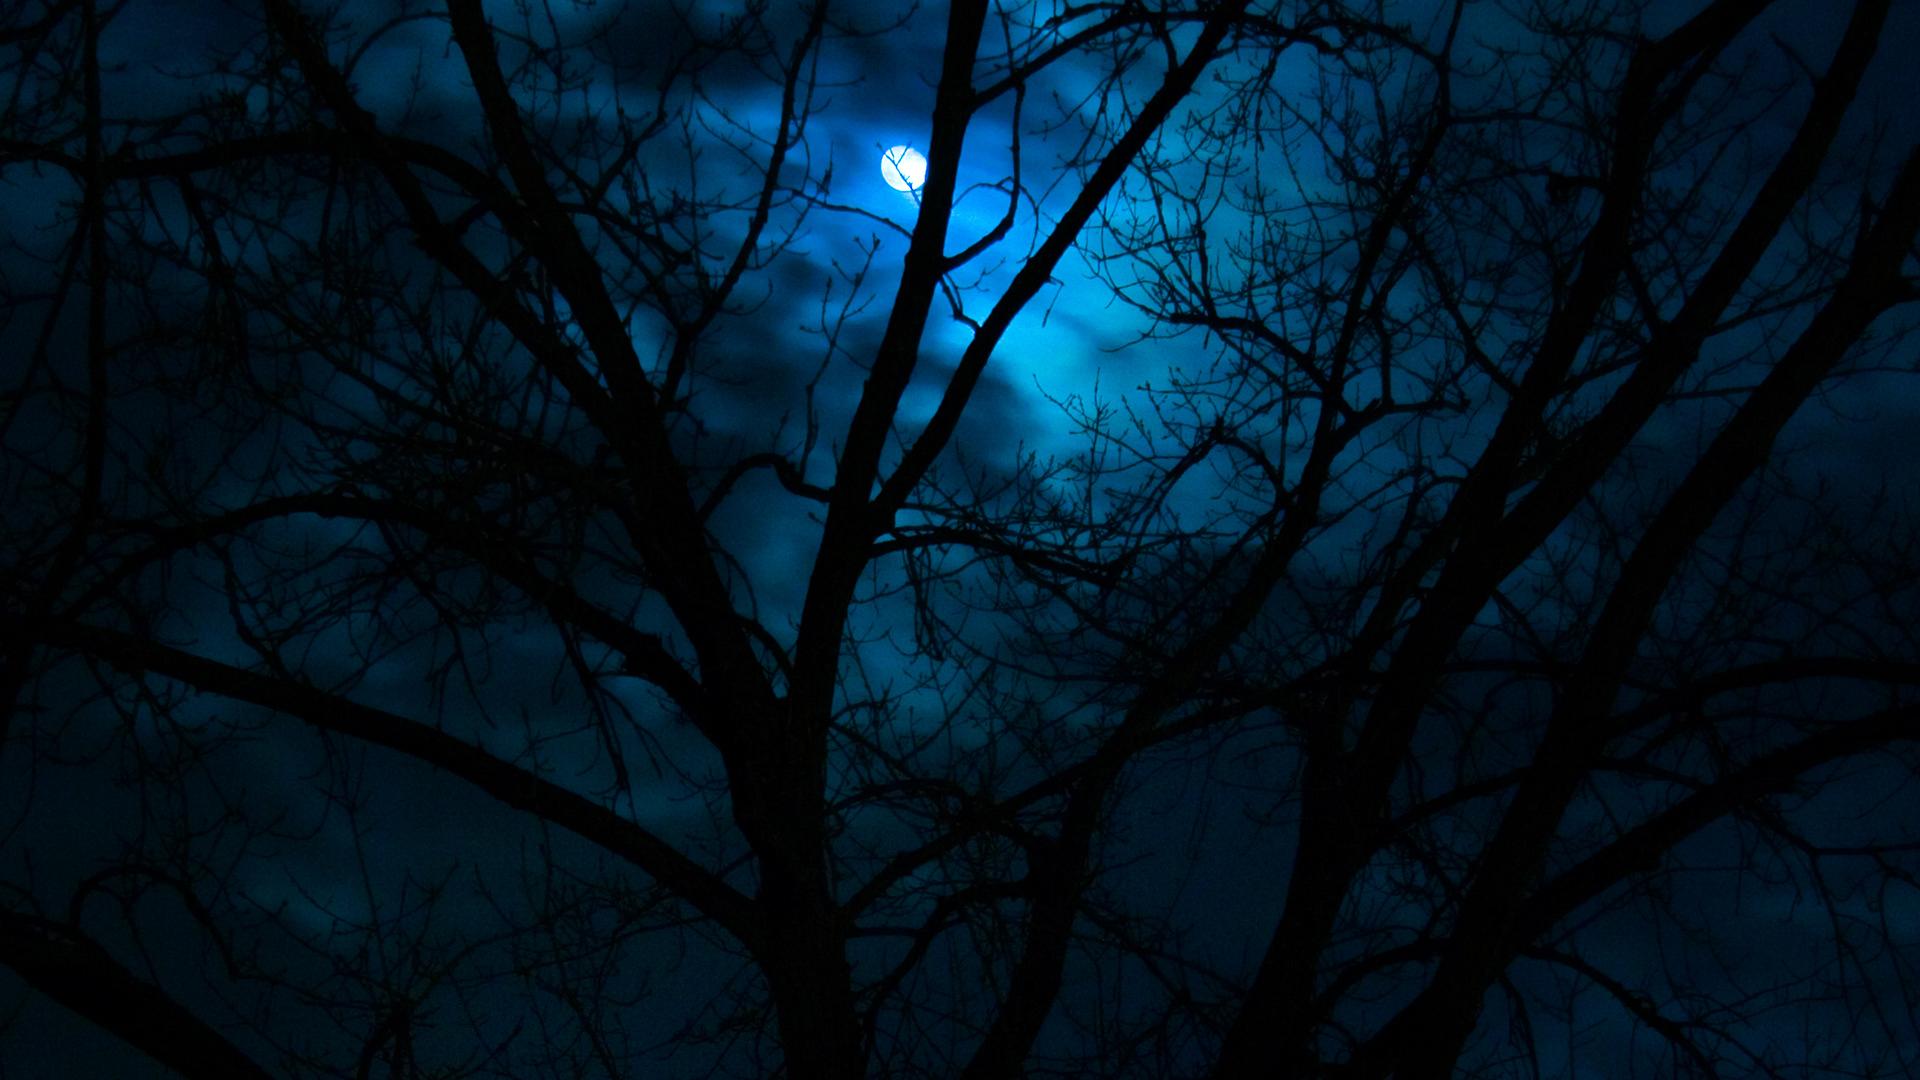 Beautiful Dark Scenery Moon In Forest 1920x1080